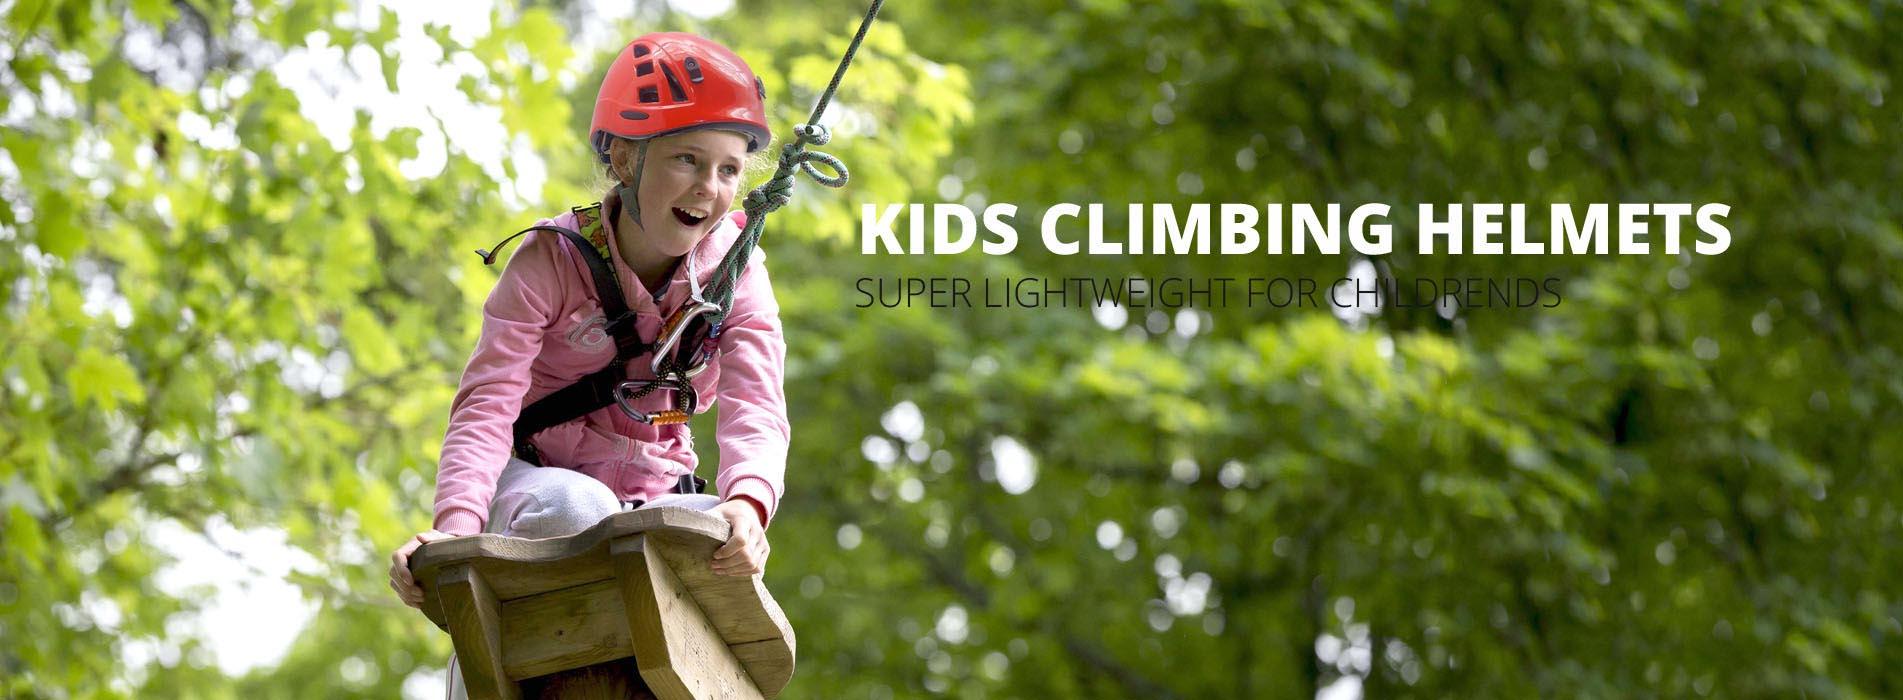 kid climbing helmet banner